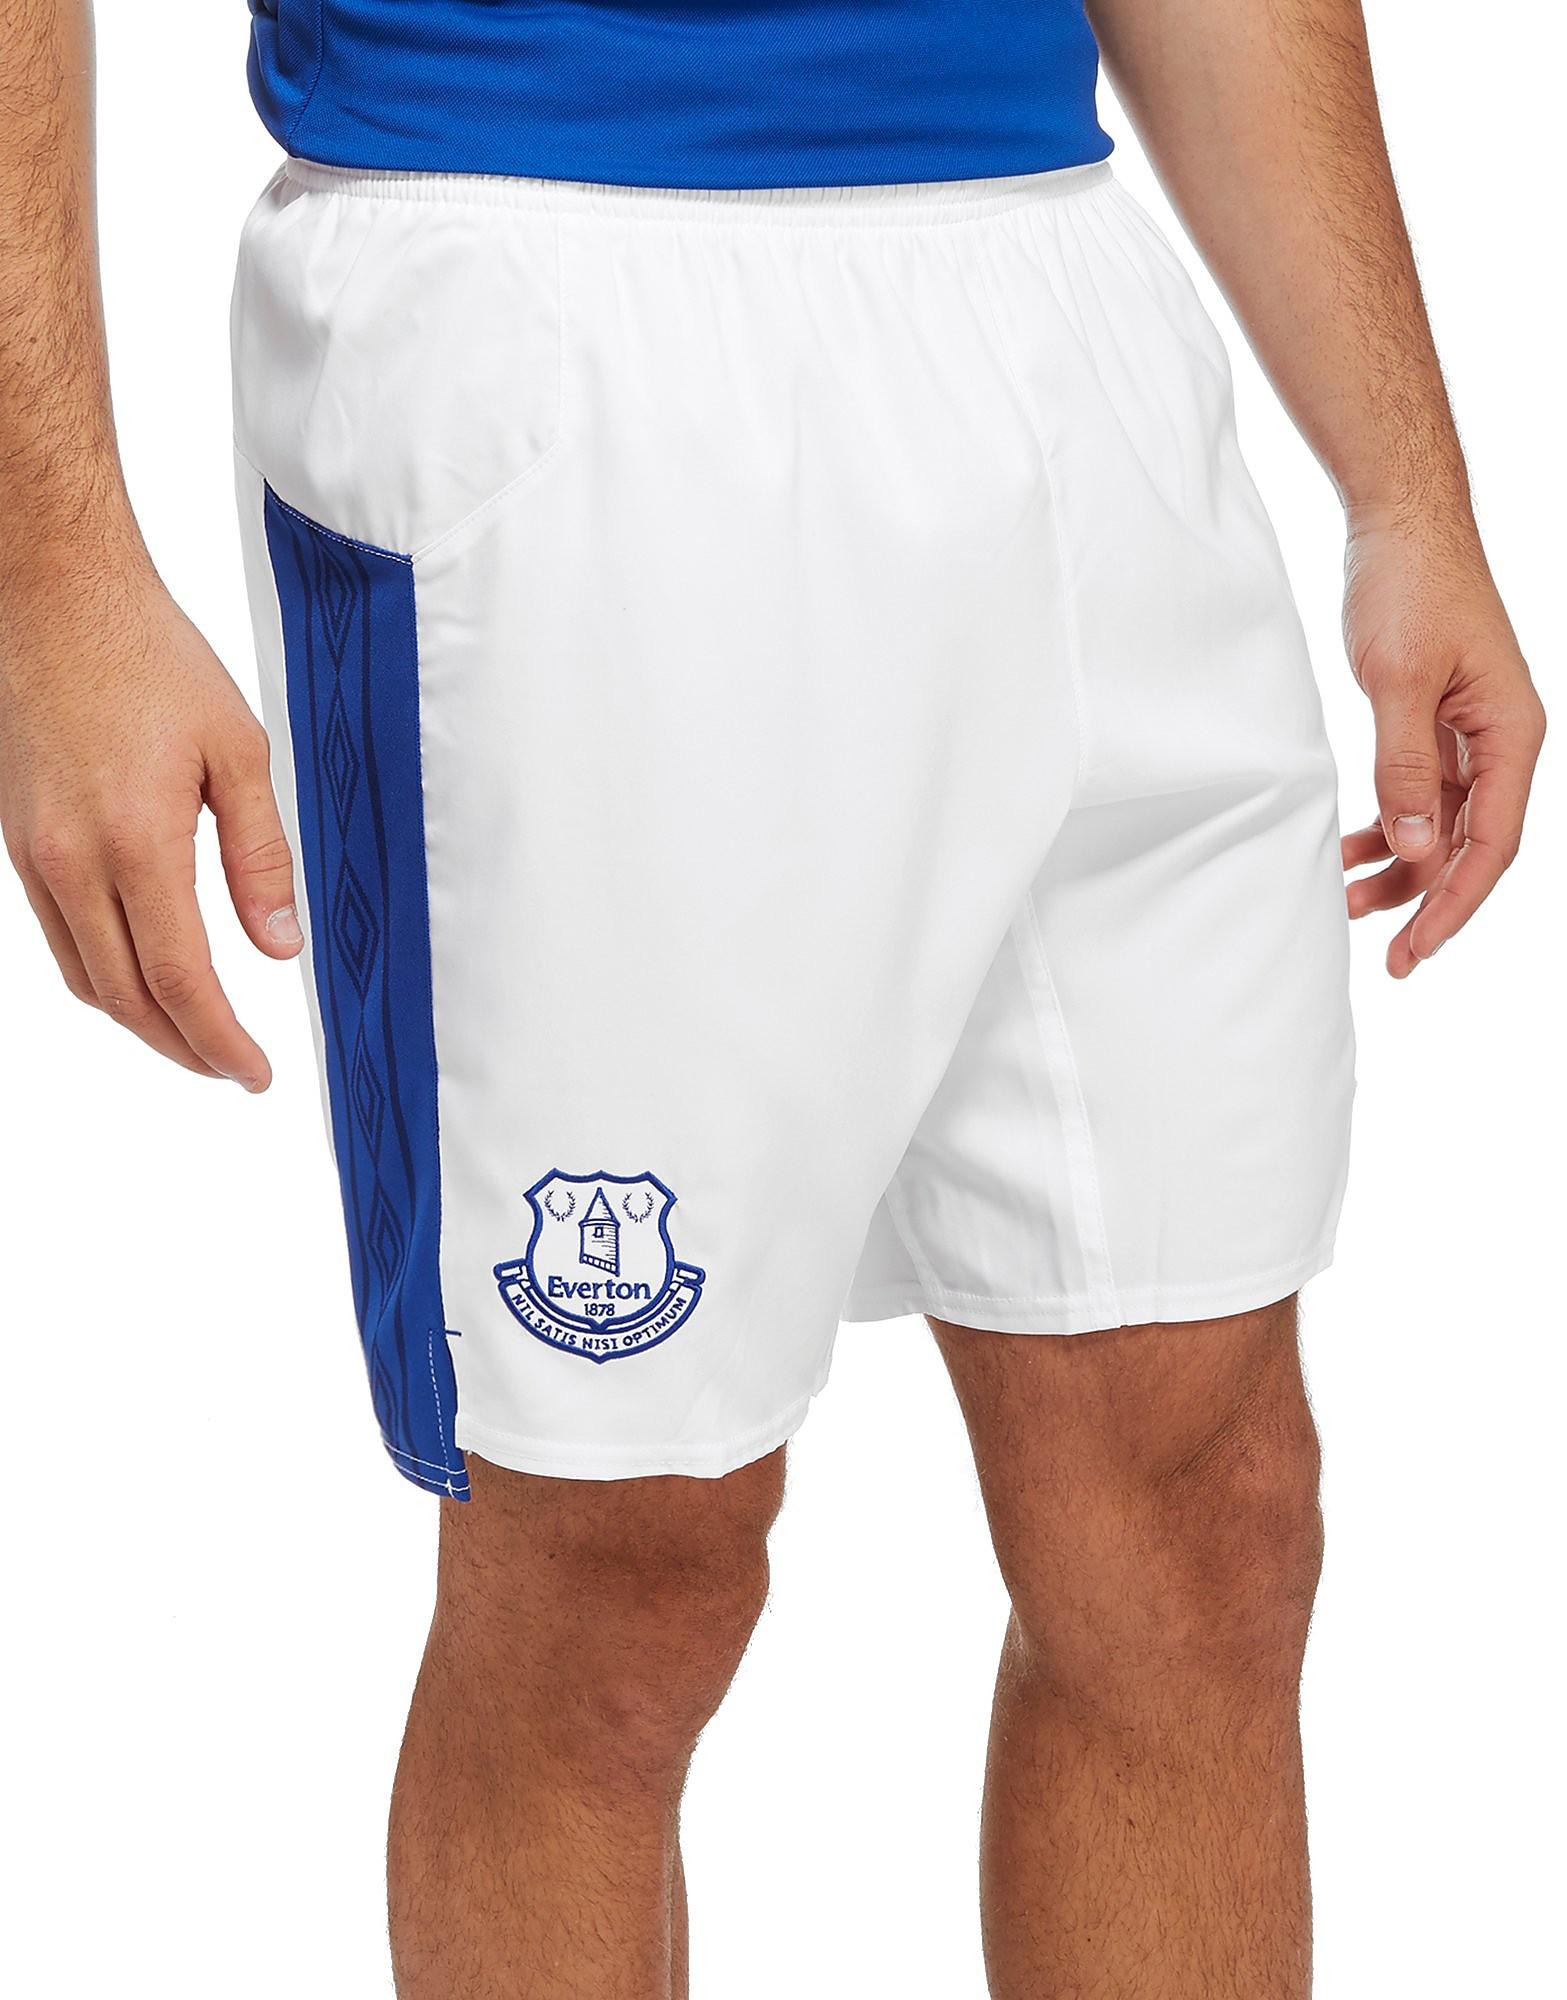 Umbro Everton FC 2017/18 Home Shorts